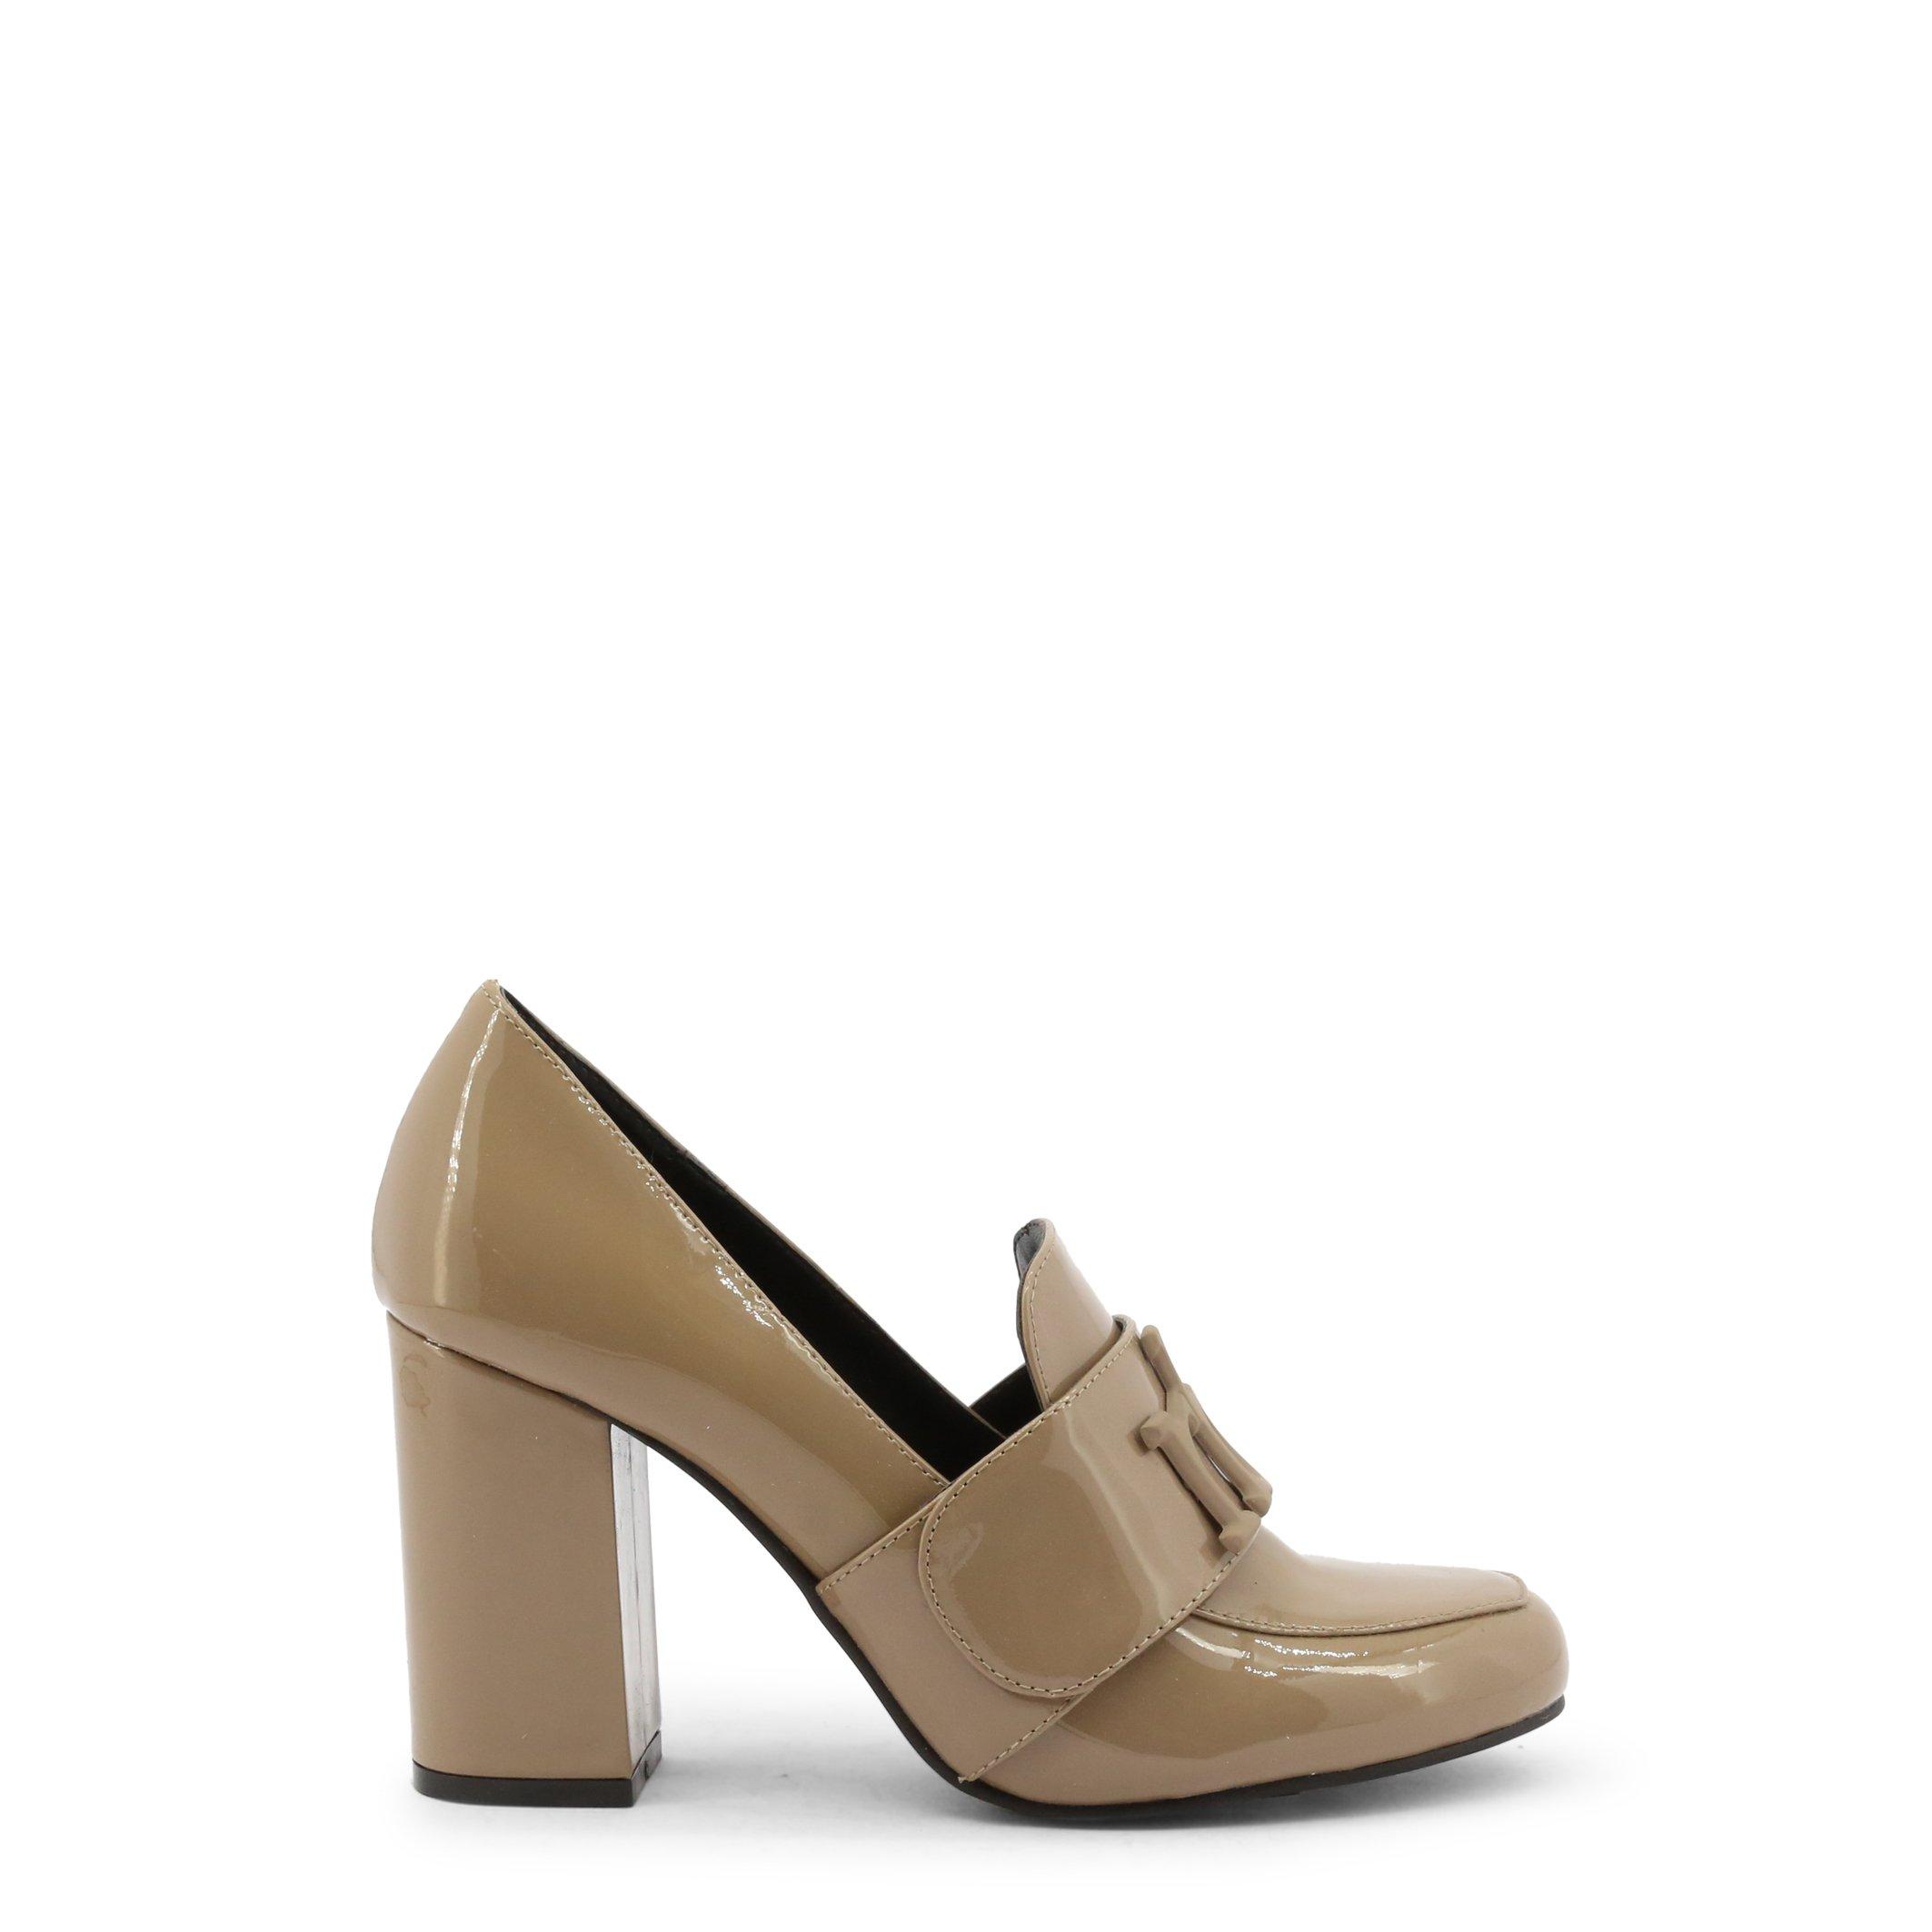 Roccobarocco Women's Heels Black 342838 - brown EU 37